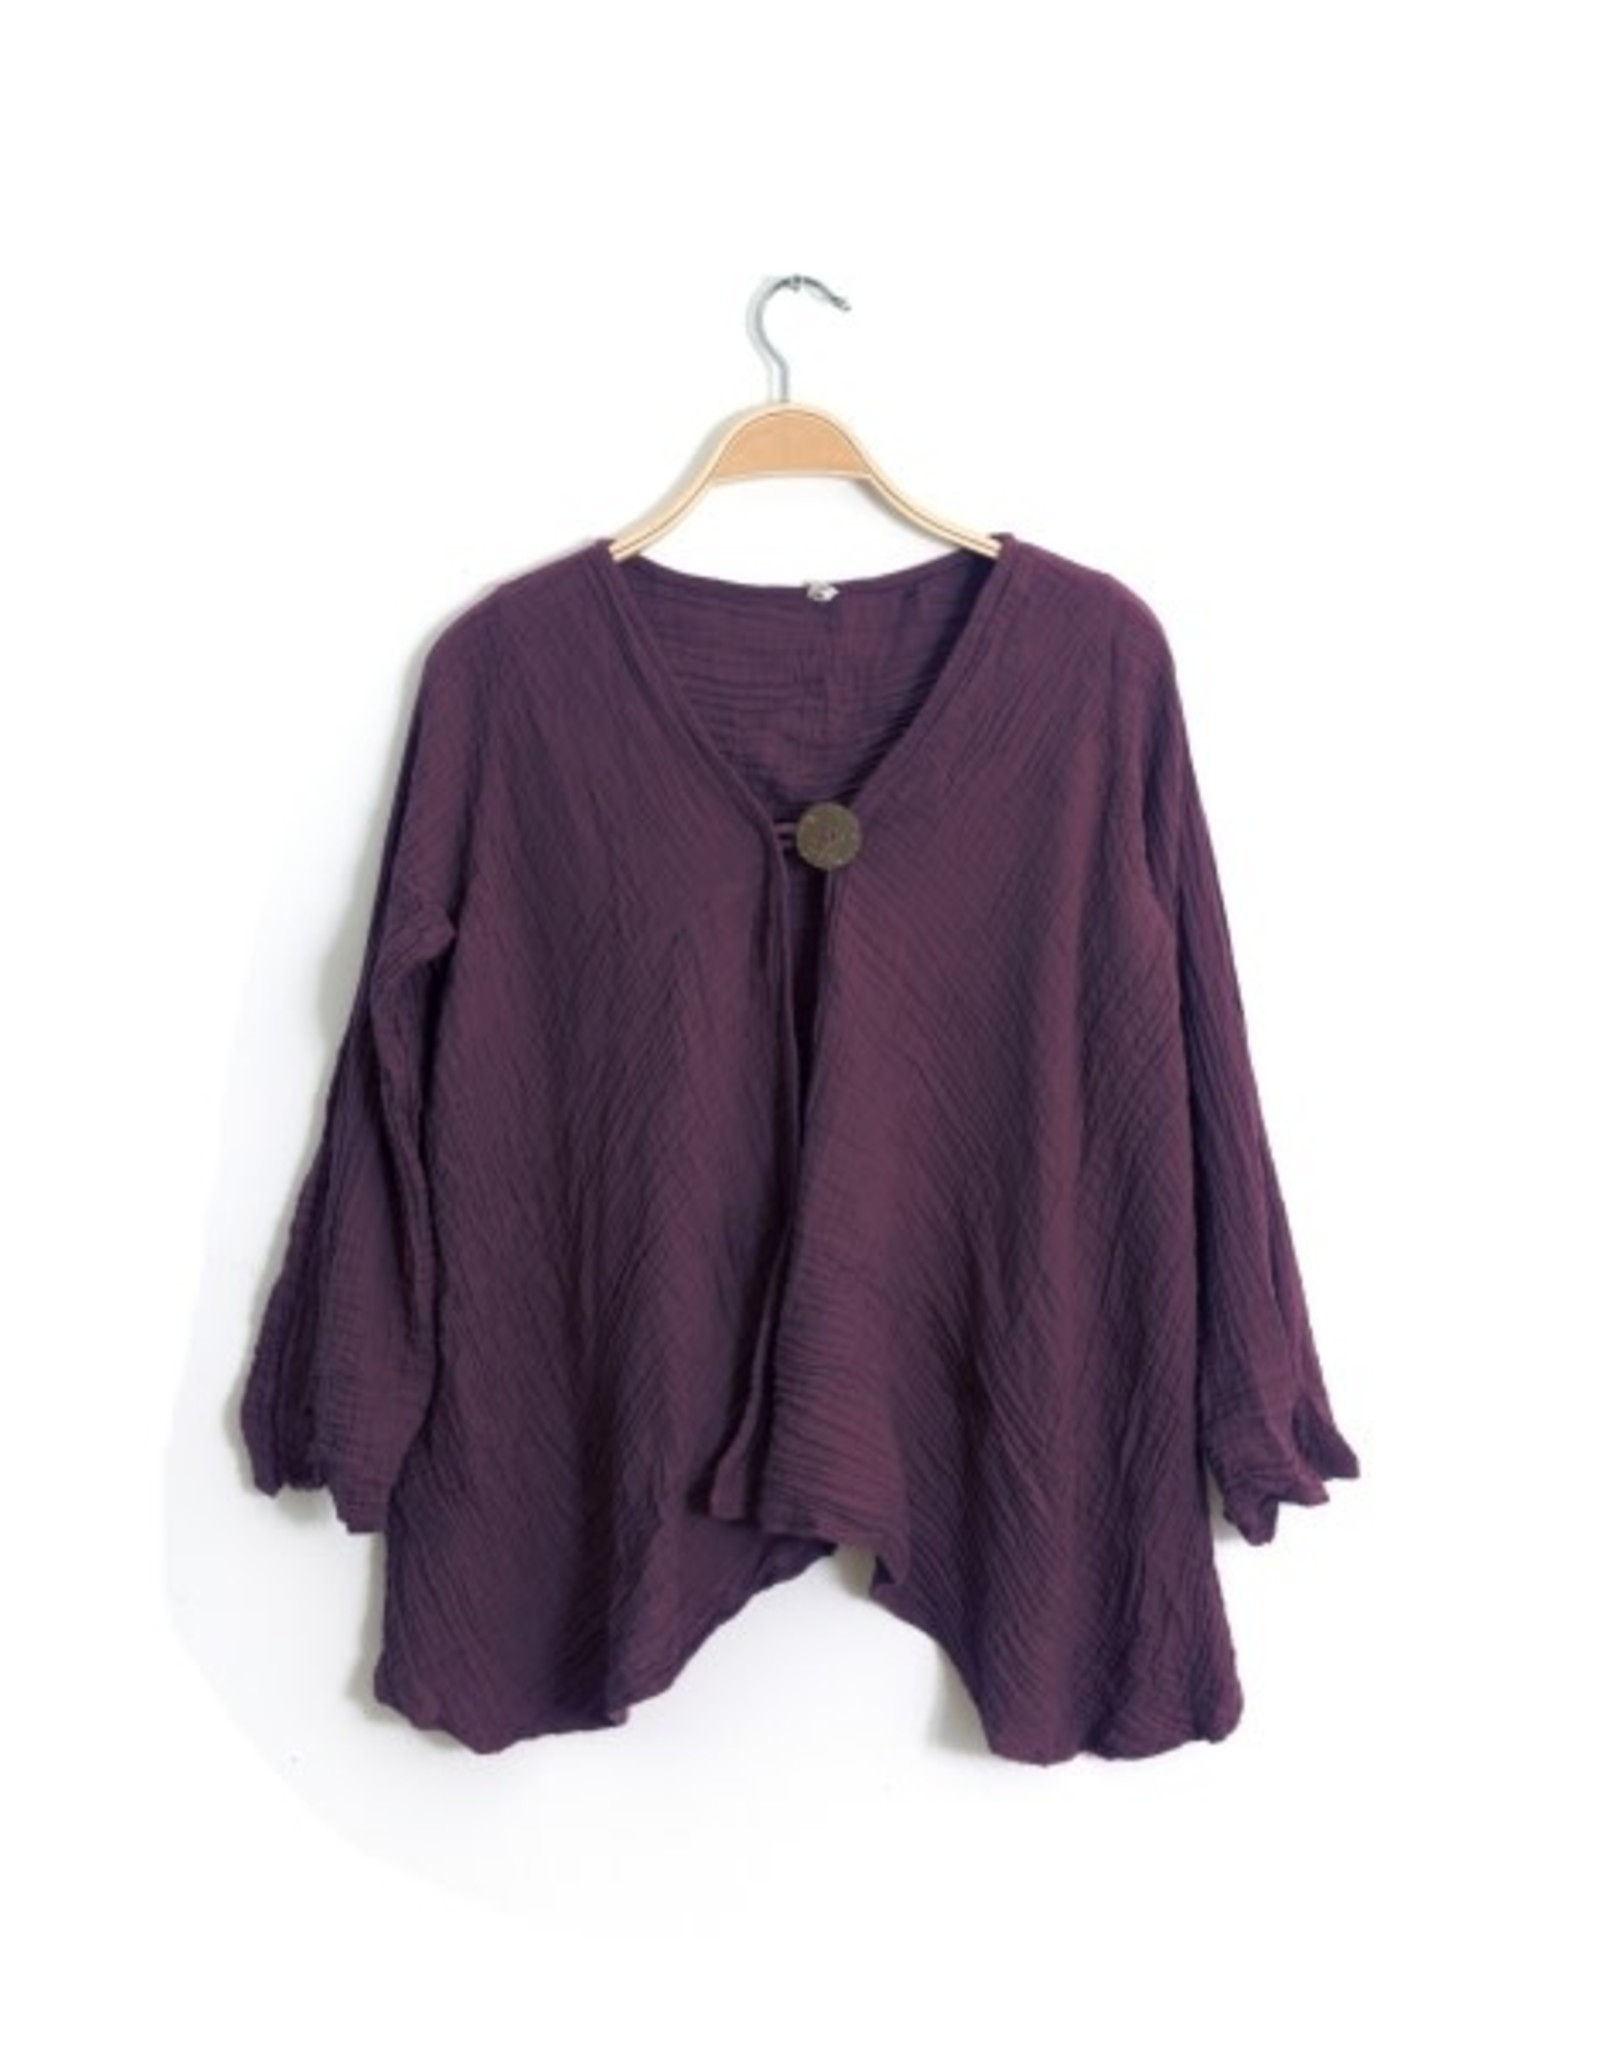 One Button Jacket, Mulberry L/XL, Thailand